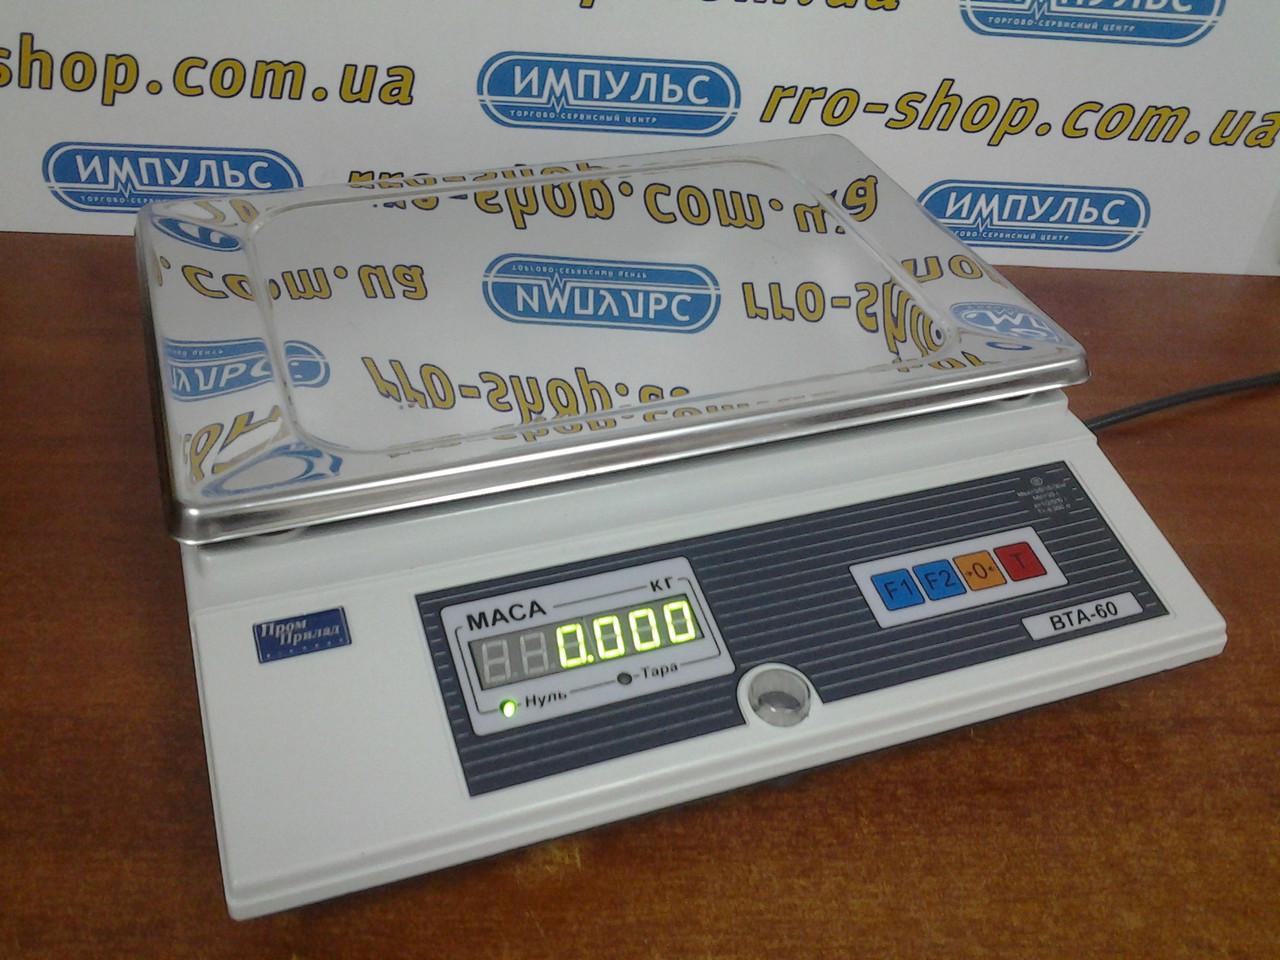 Весы фасовочные ВТА-60/6-7-А (3 кг, 6 кг, 15 кг, 30 кг)